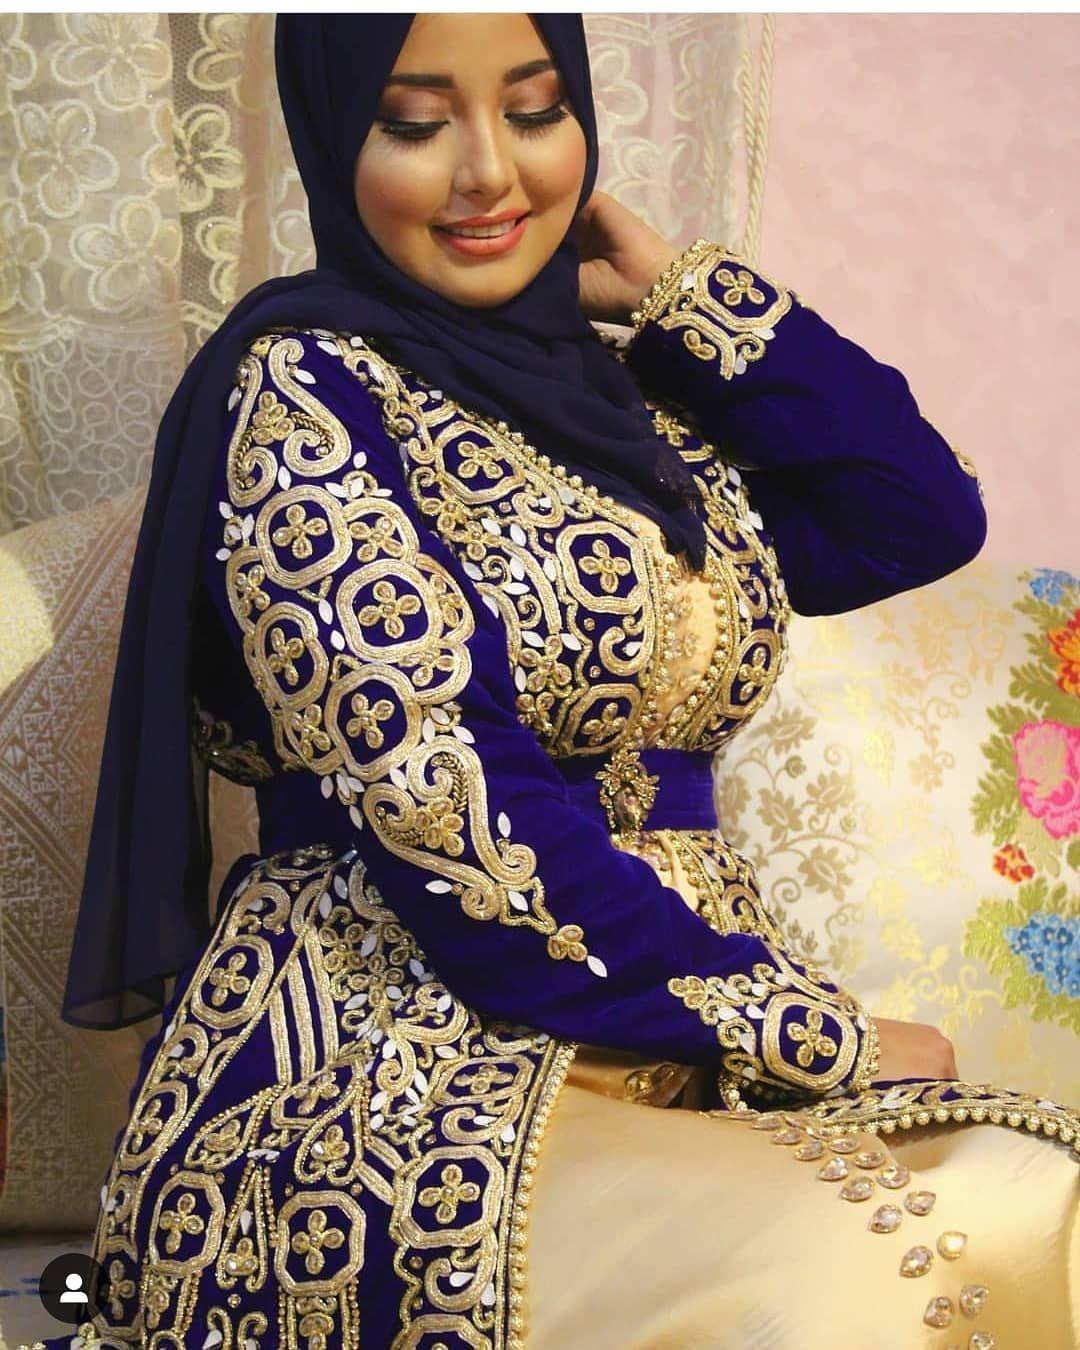 L Image Contient Peut Etre 2 Personnes Muslim Fashion Hijab Hijab Fashion Beautiful Muslim Women